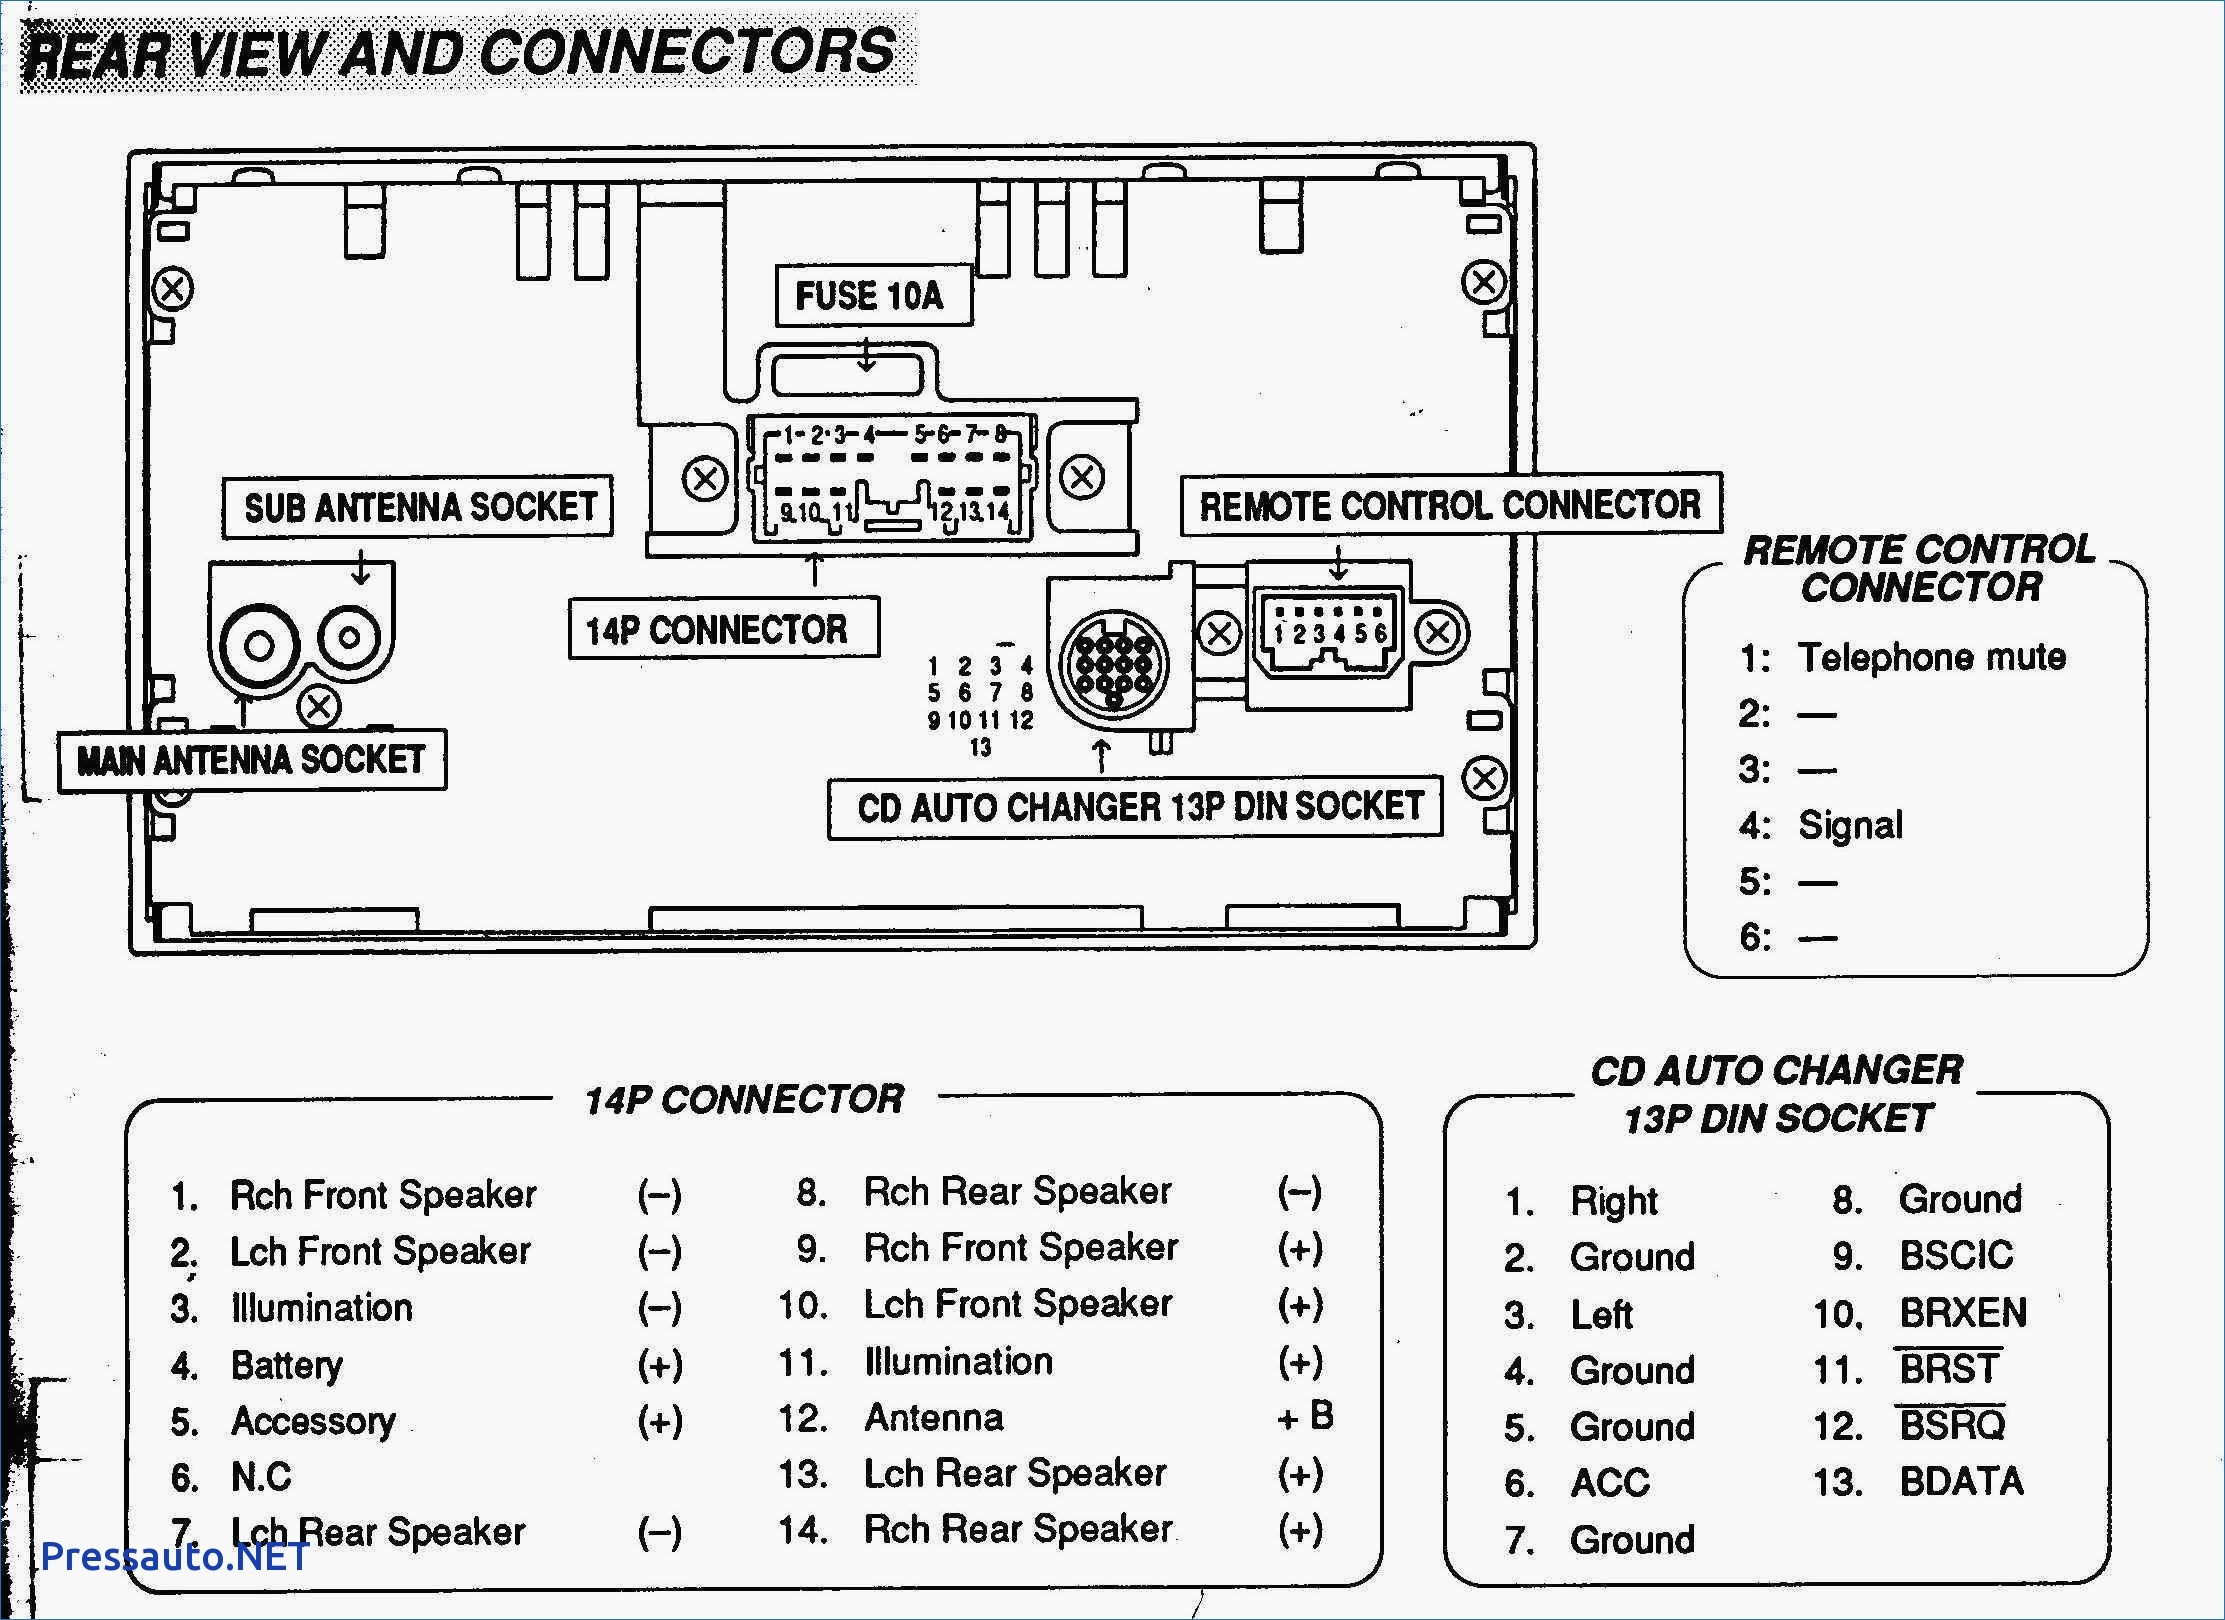 Fancy 2000 Vw Golf Wiring Diagram Mold Electrical and Wiring 2000 Jetta  Radio Wiring Diagram 2000 Jetta Radio Wiring Diagram 2001 Volkswagen ...